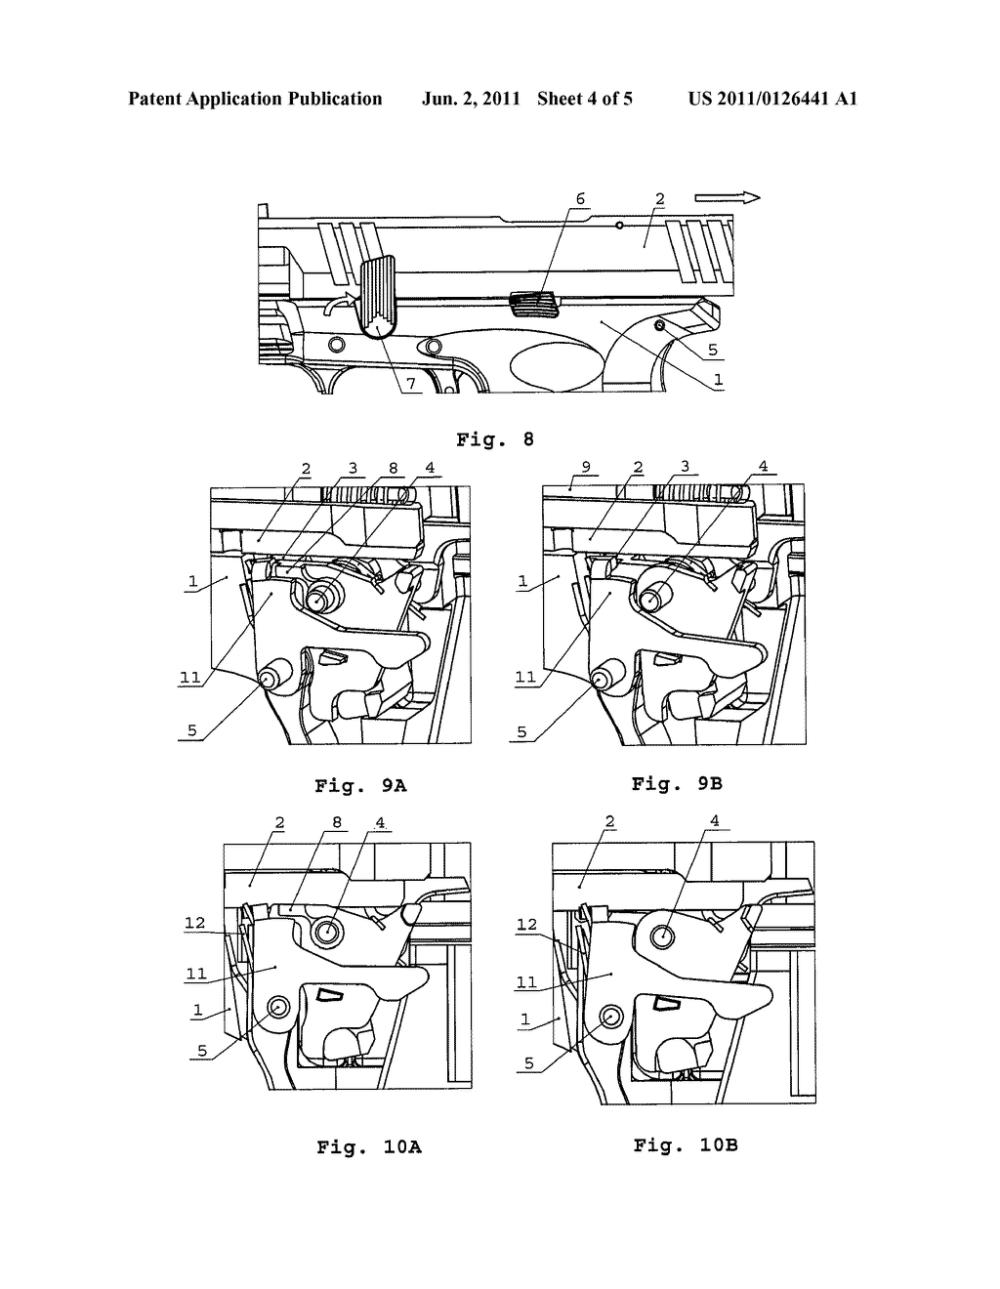 medium resolution of magazine dependent safety mechanism of a handgun diagram schematic and image 05